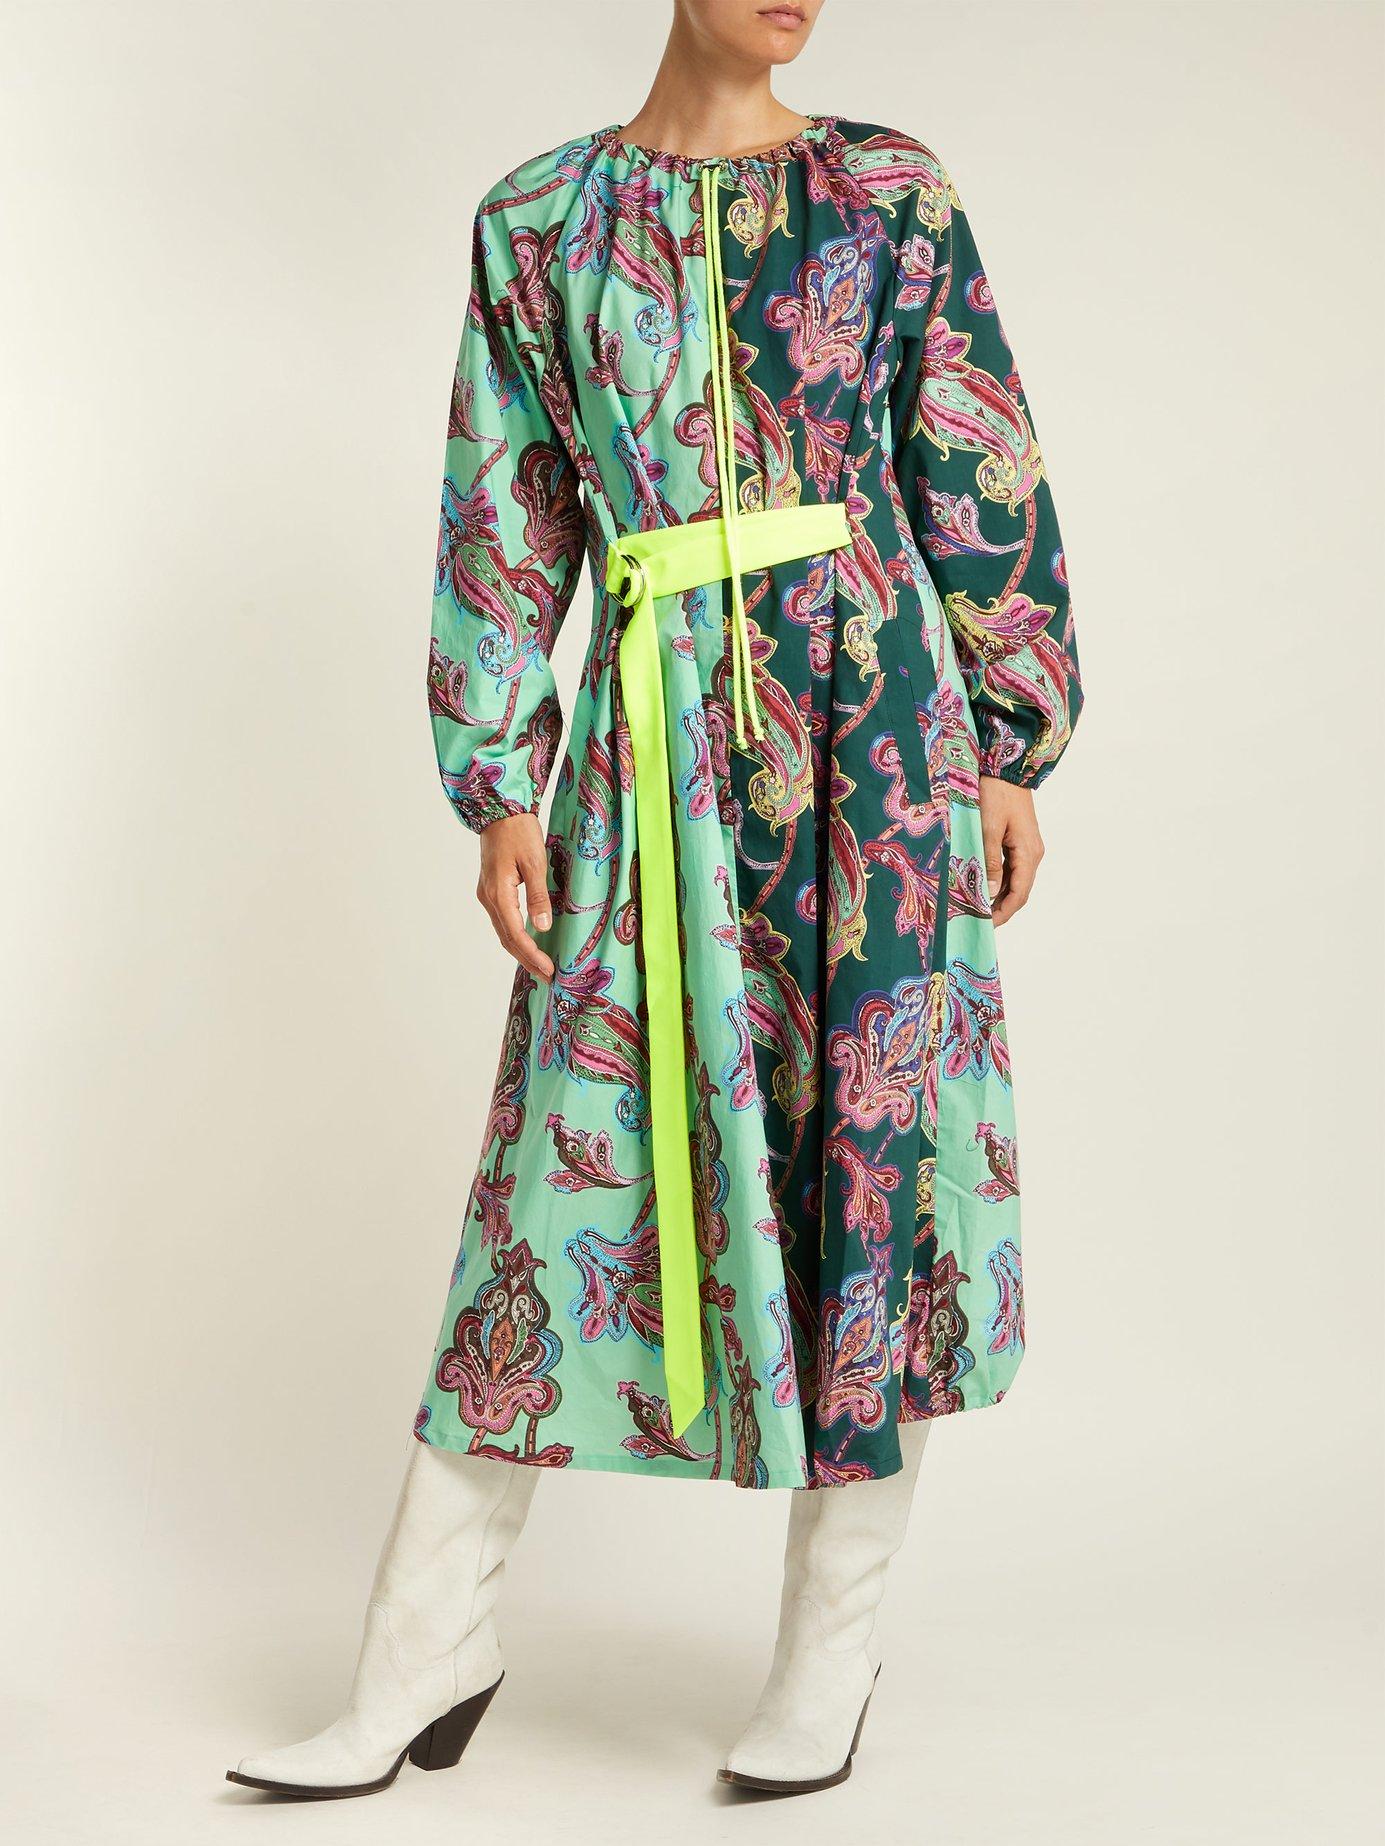 Paisley-print patchwork cotton-poplin dress by Tibi